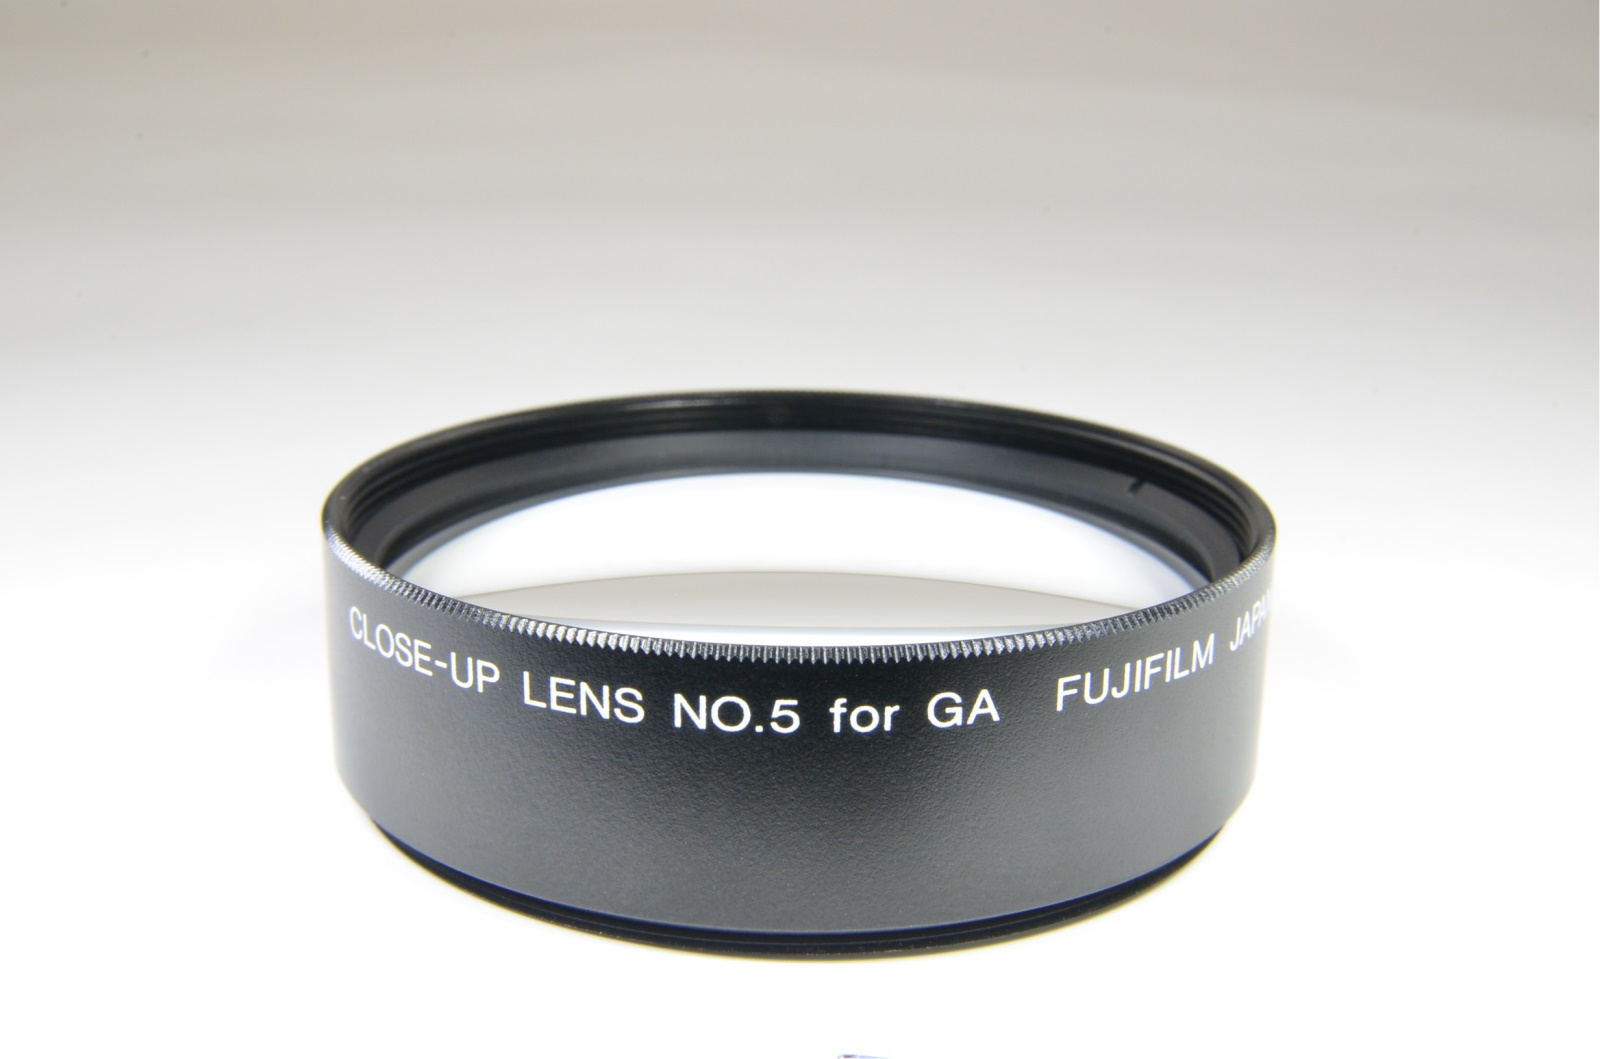 fuji fujifilm ga close-up lens kit no.5 for ga645 medium format camera near mint